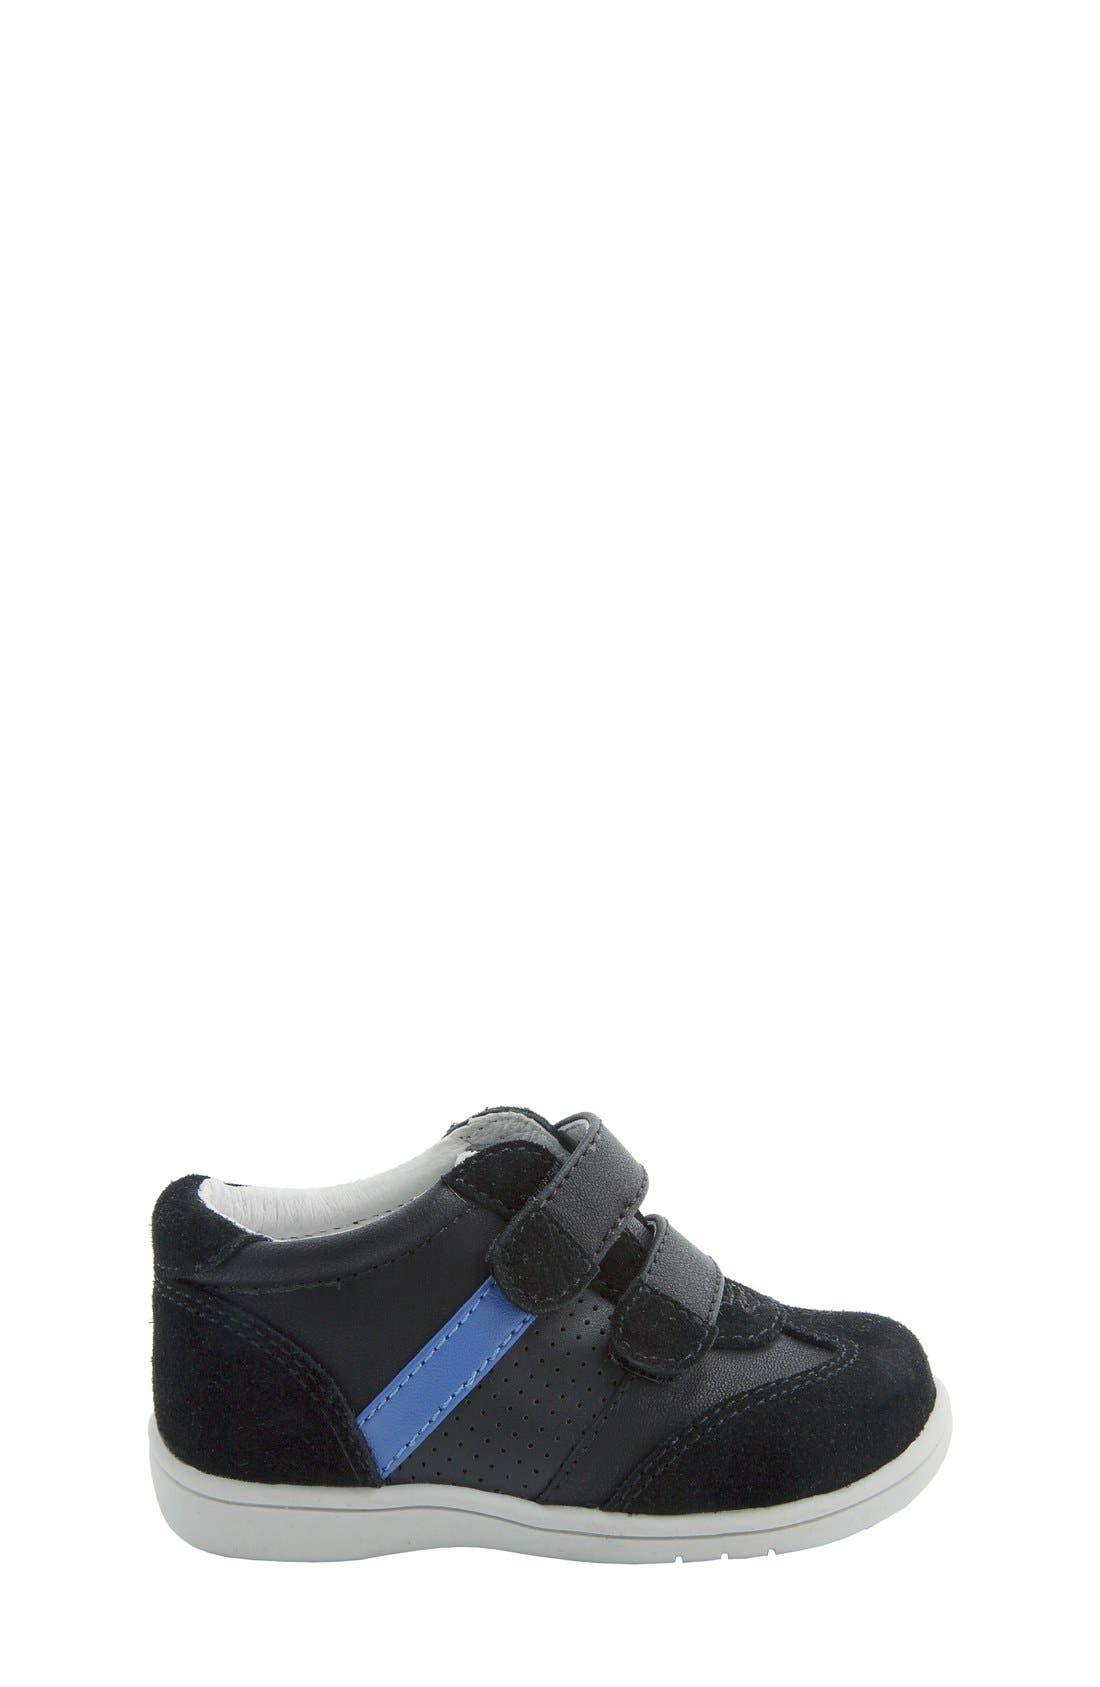 Nina 'Everest' Sneaker,                             Alternate thumbnail 2, color,                             Black Burnished